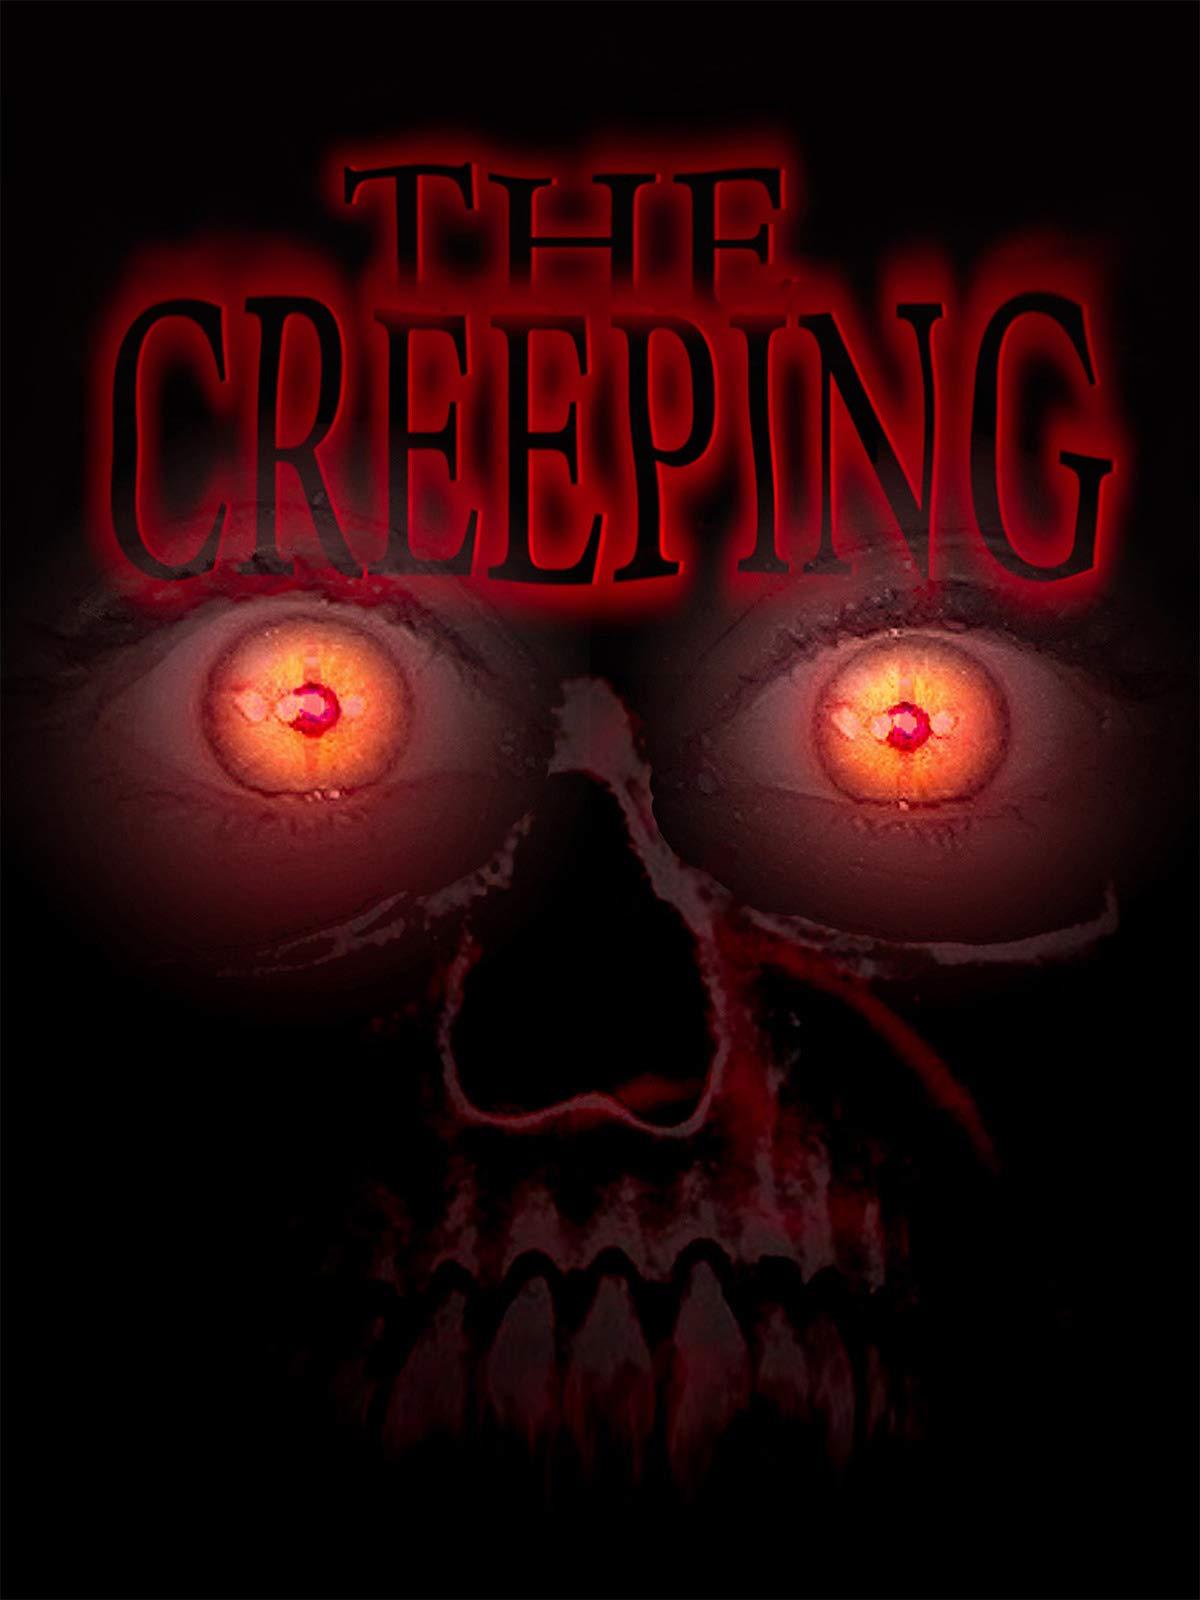 The Creeping